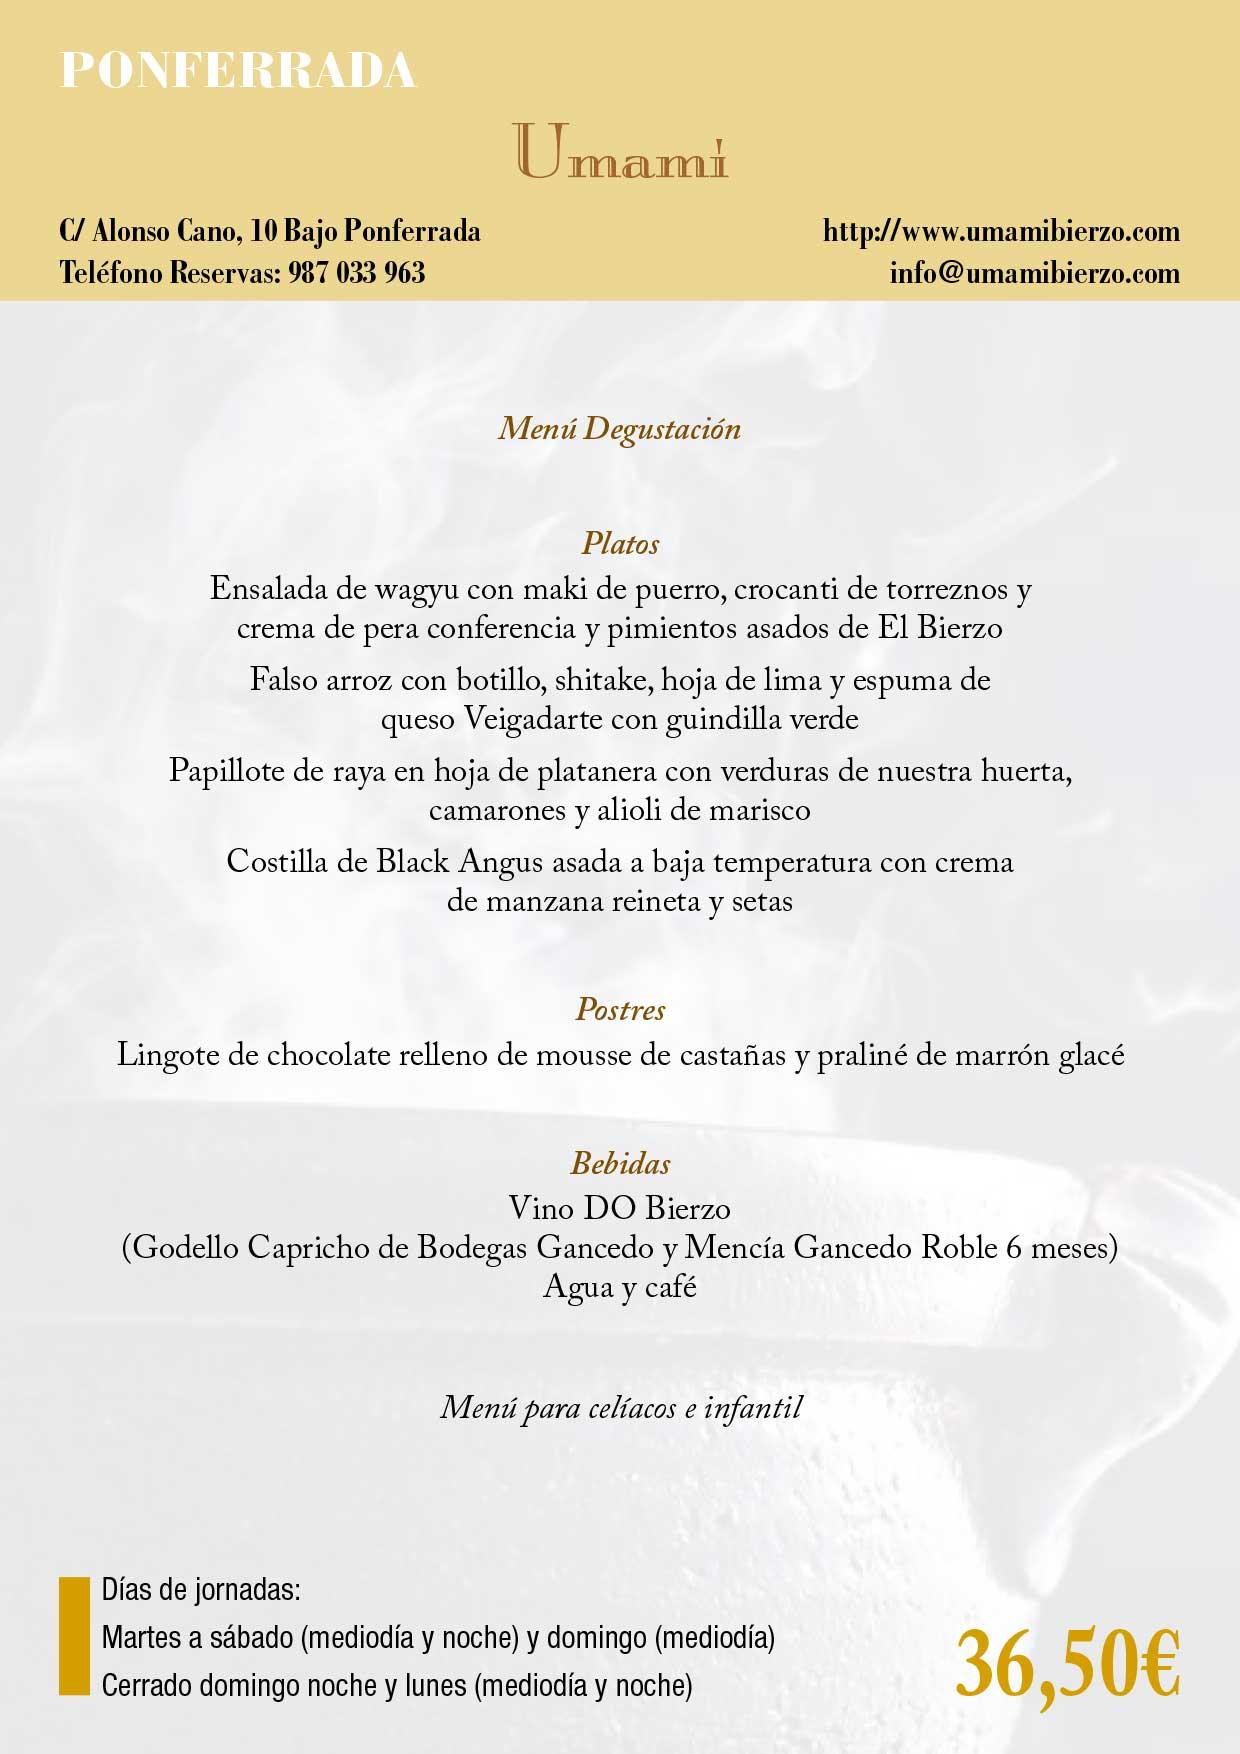 XXXIII Jornadas gastronómicas del Bierzo 2017. Restaurantes participantes 19